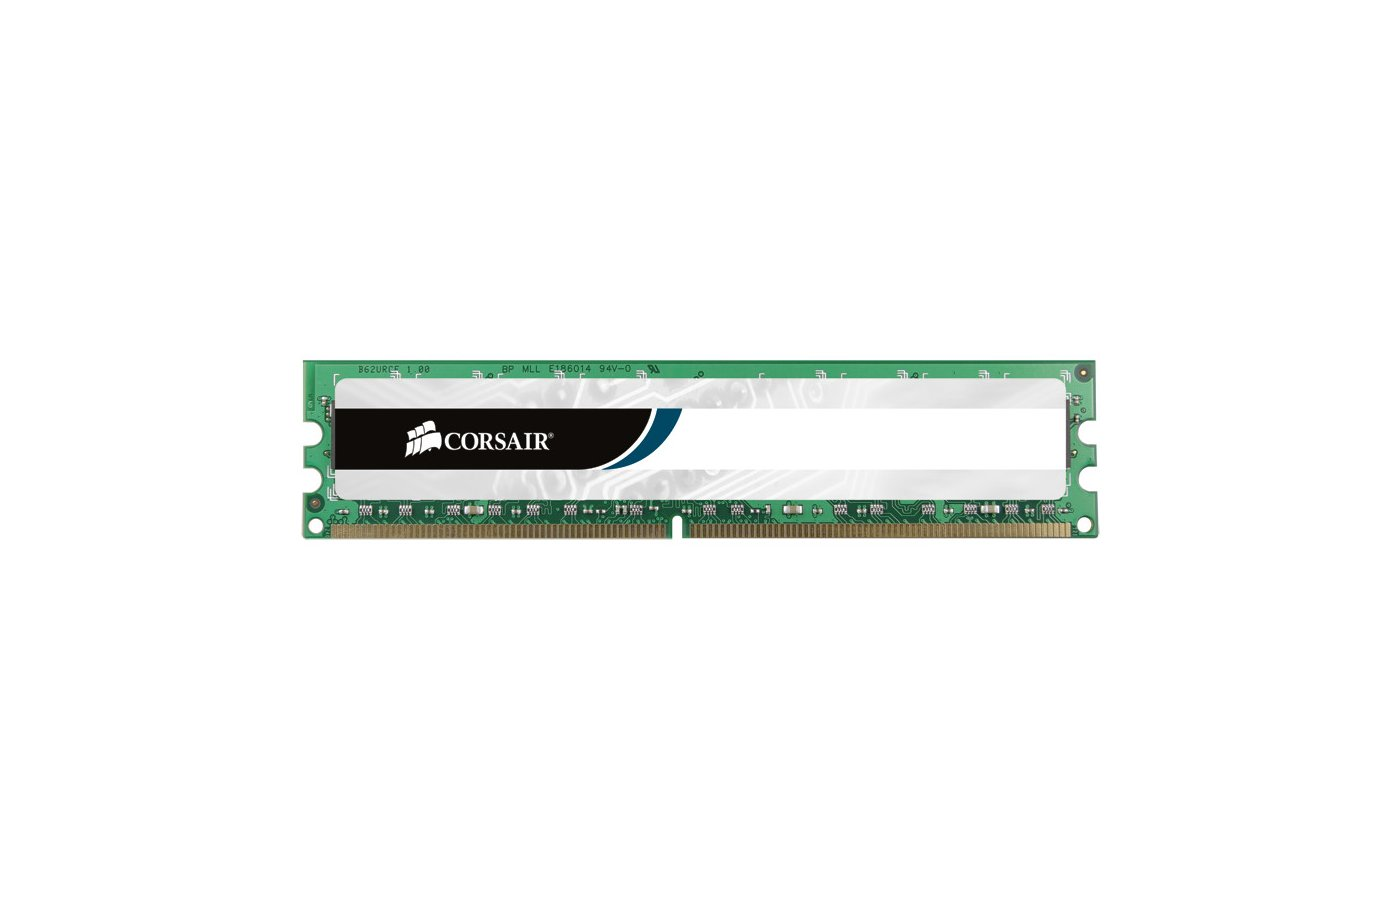 Оперативная память DDRIII 4096Mb 1600MHz Corsair CMV4GX3M1A1600C11 RTL